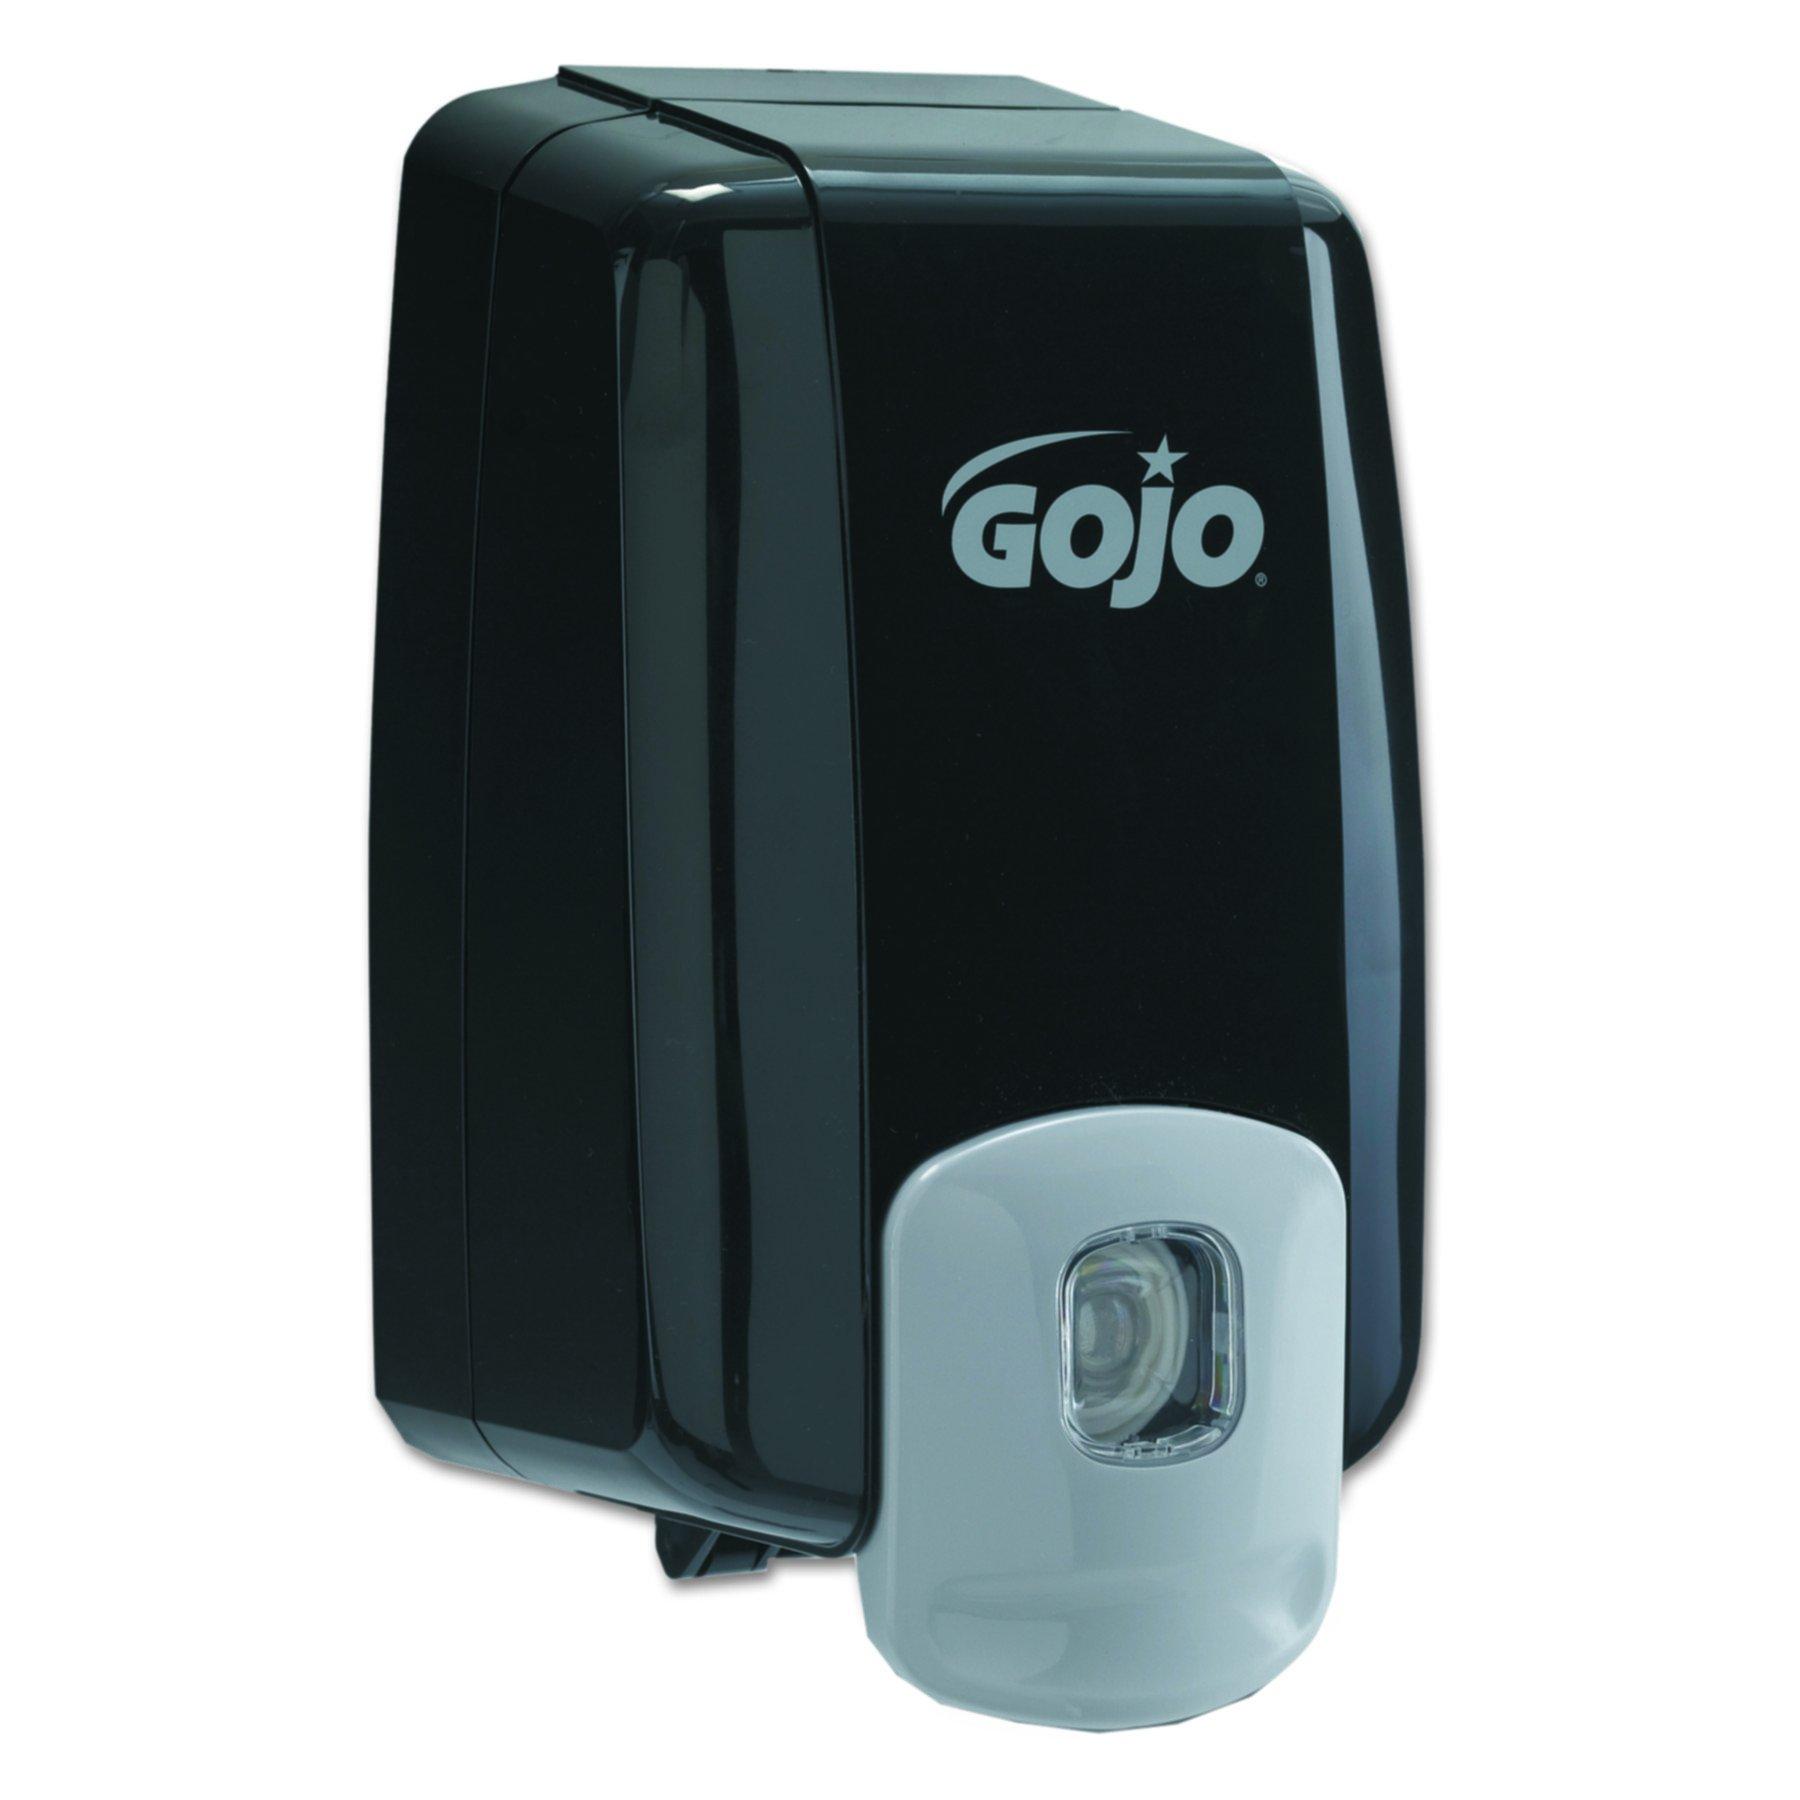 GOJO 2235 NXT Maximum Capacity Dispenser NXT 2000 ml, Wall Mountable, Black by Gojo